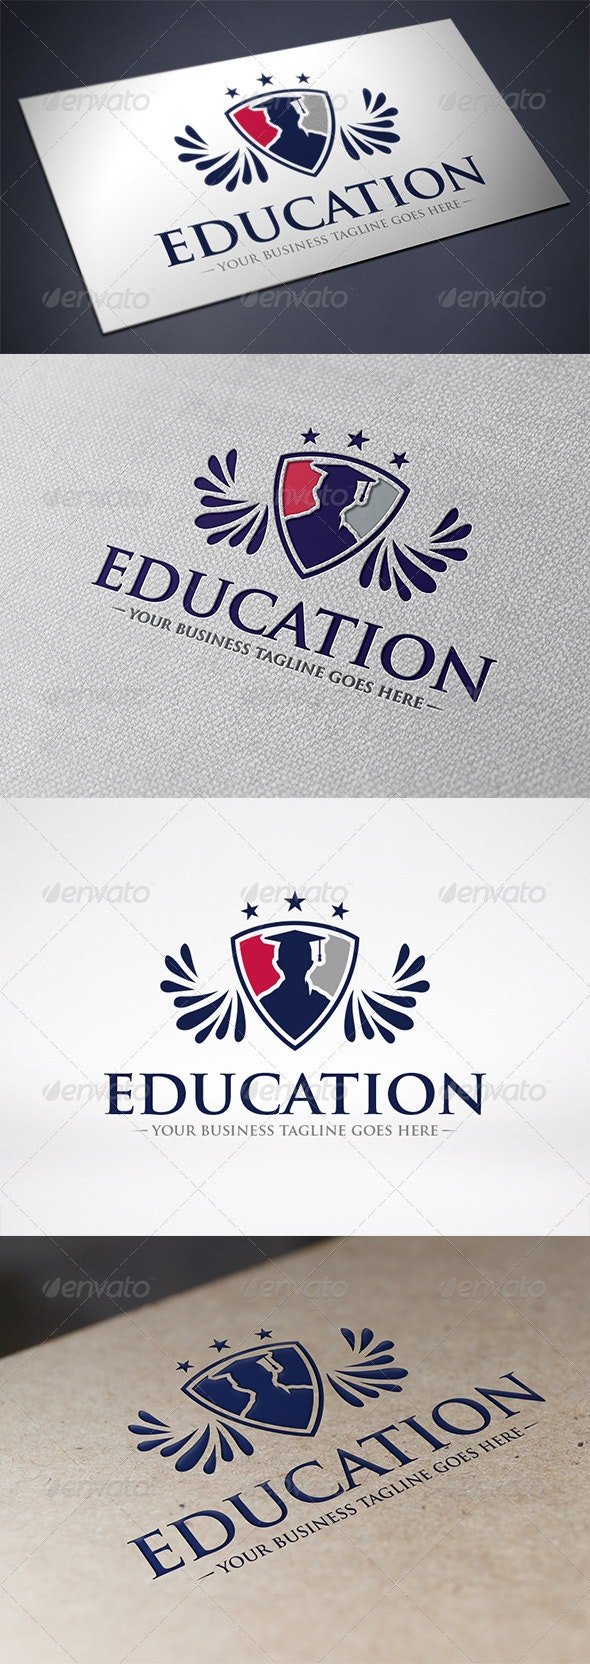 Education Logo Template - Crests Logo Templates